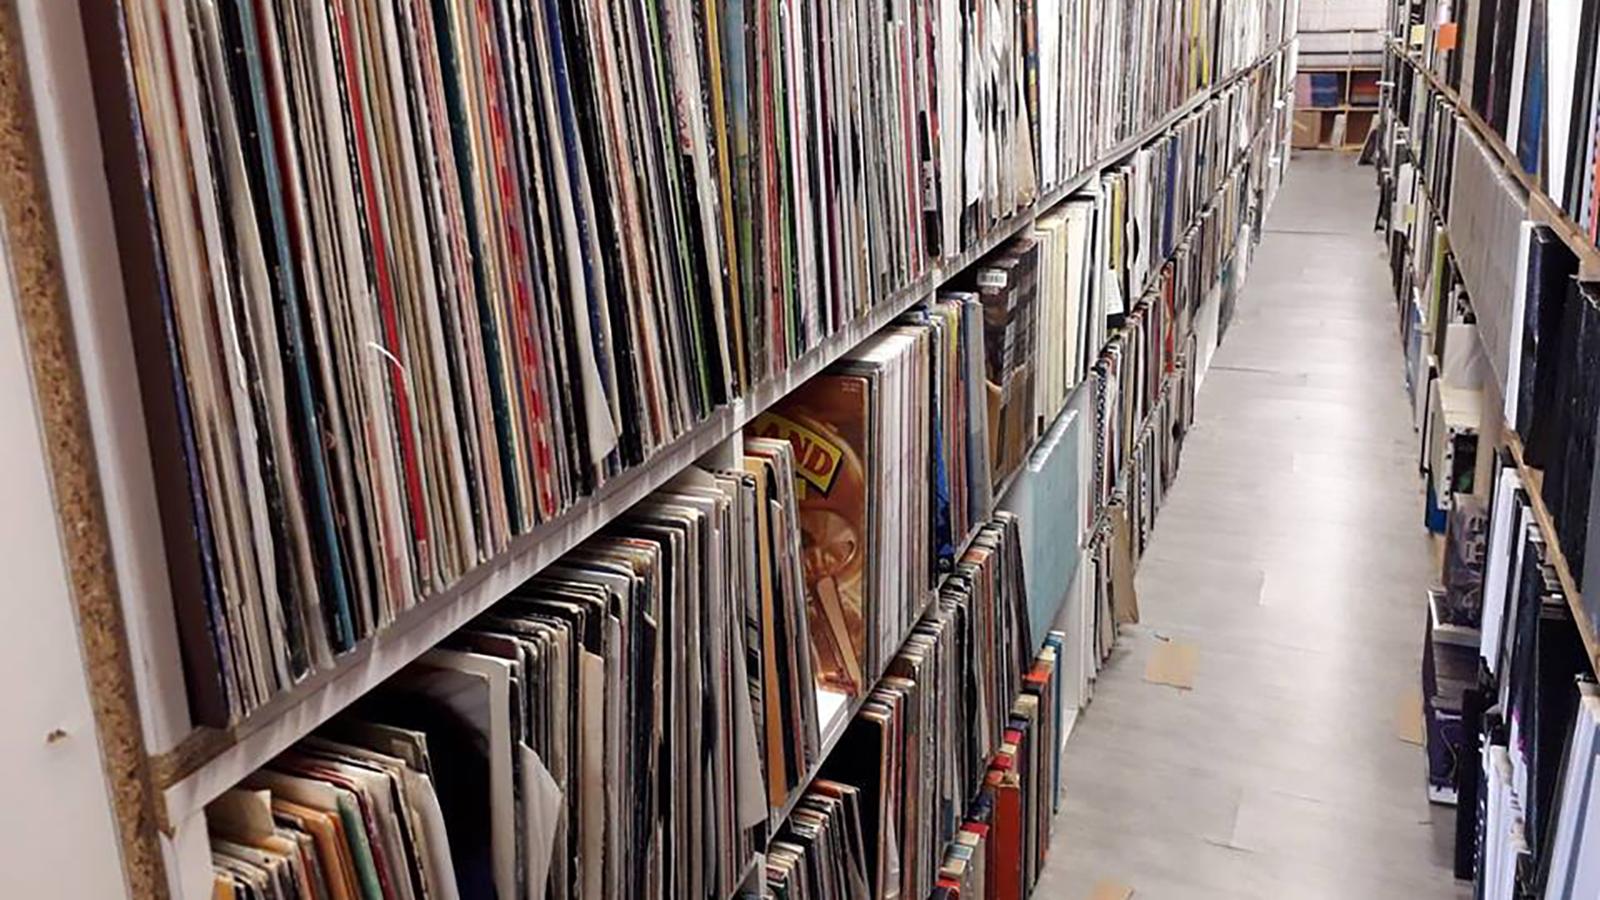 Jean Yaghlekdjian Vinyl Discount 1